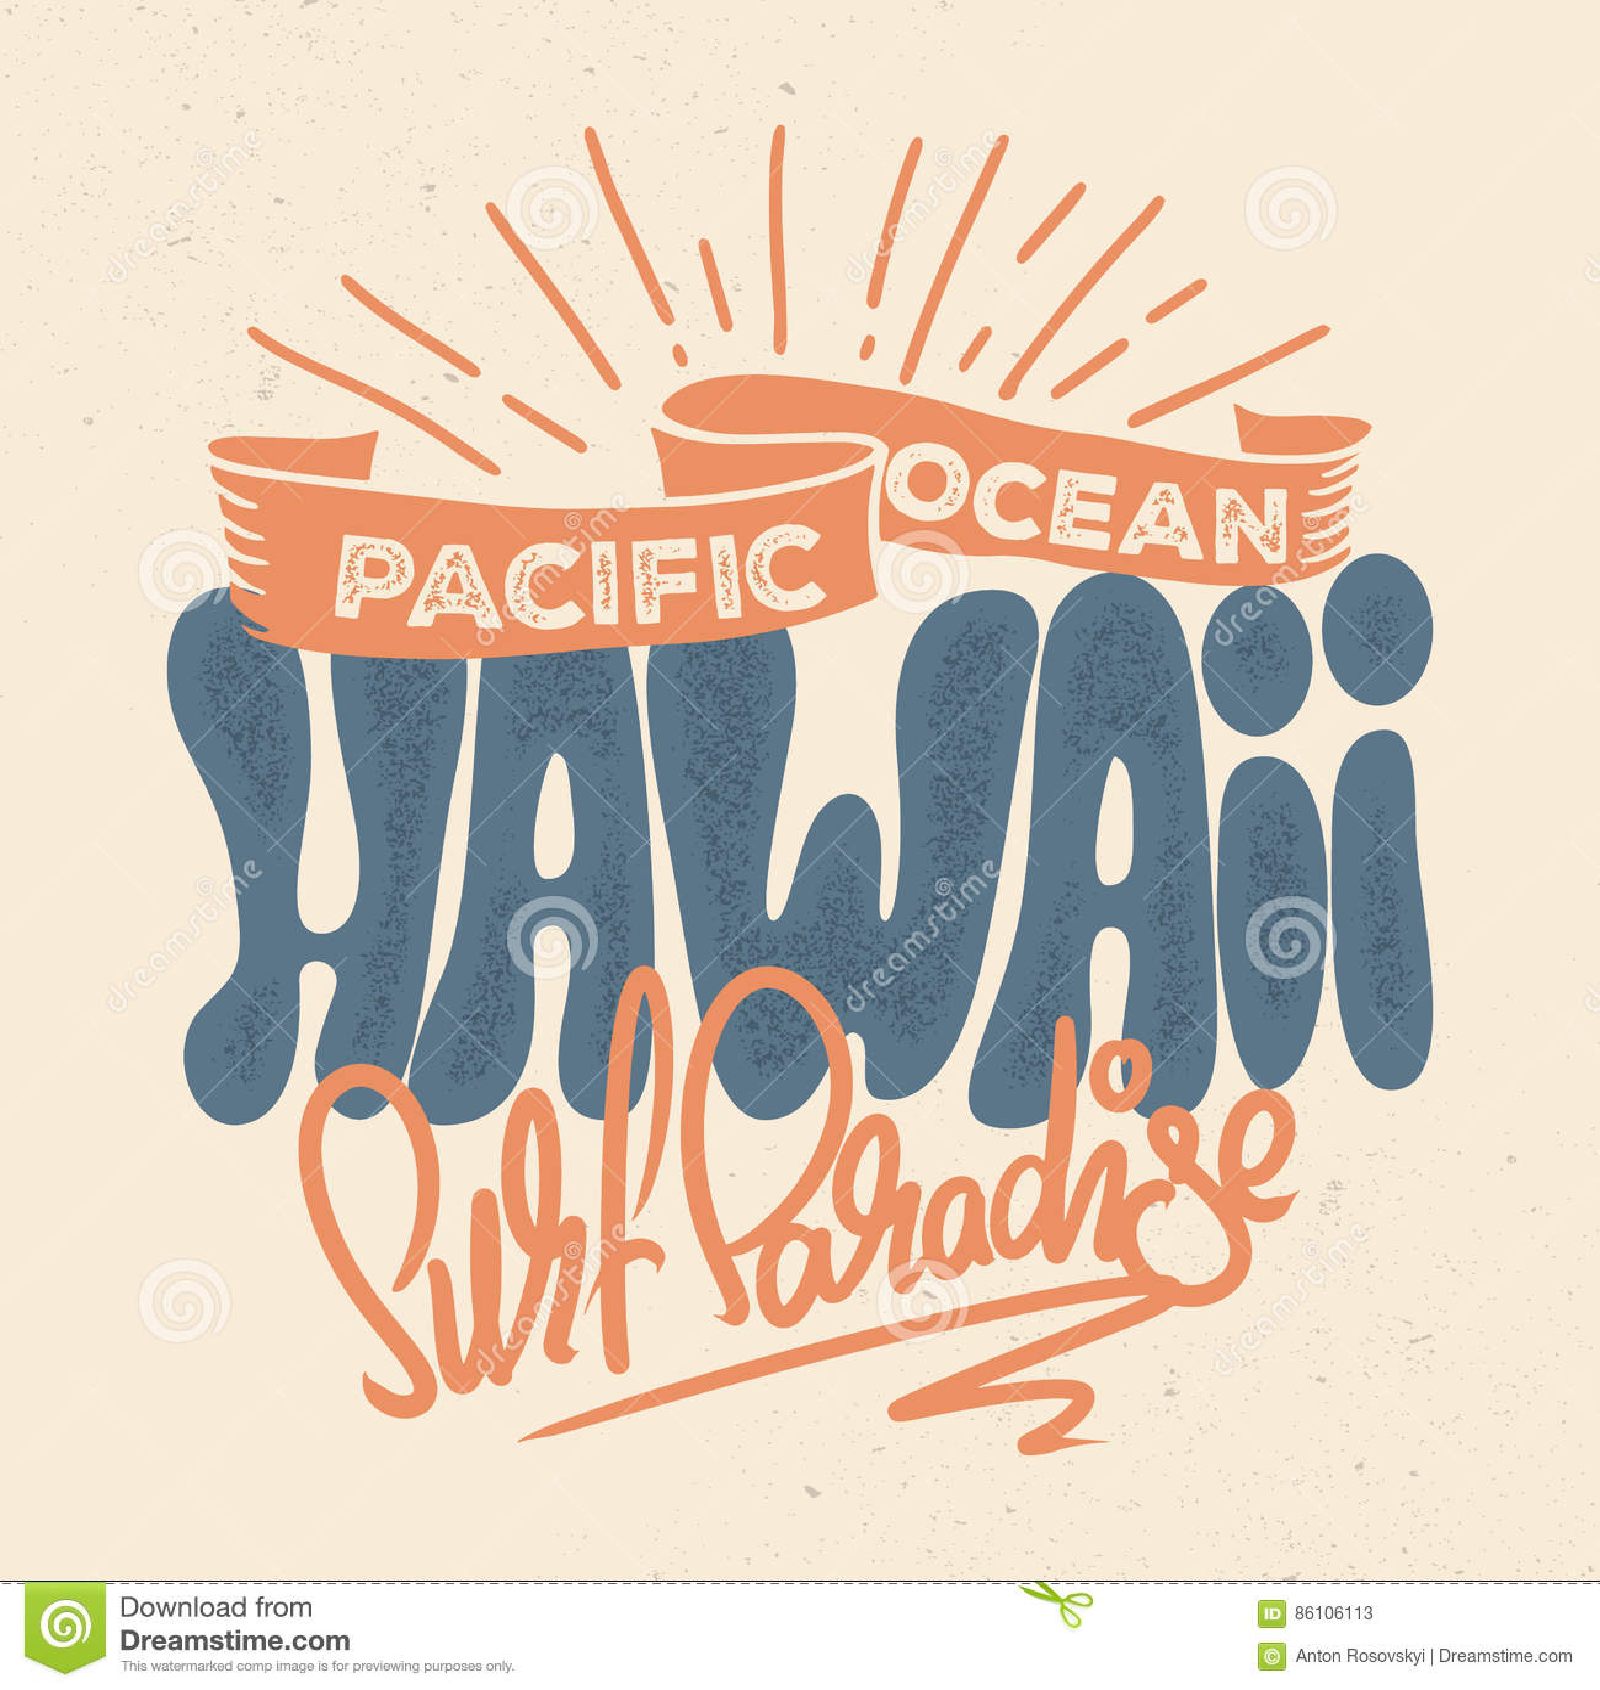 T shirt design hawaii - T Shirt Design Of Hawaii In Retro Style